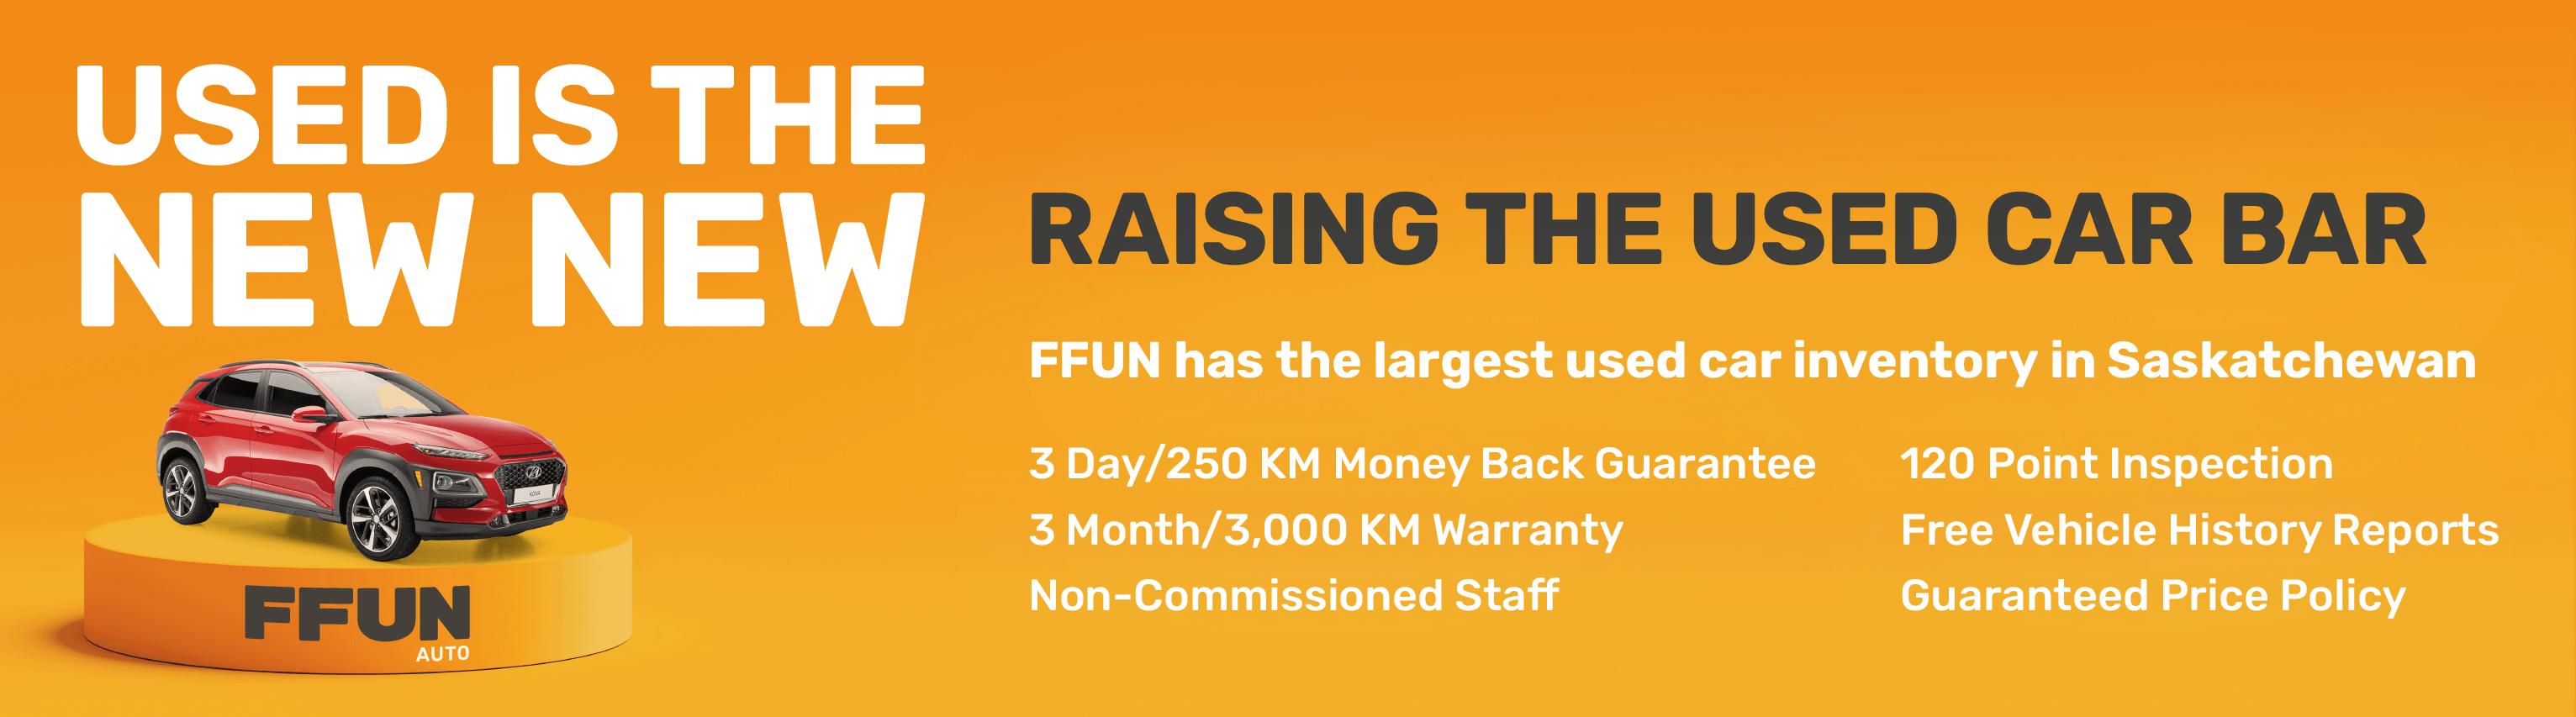 FFUN_Pre-Owned-Campaign_C3_-Website-Page-copy-3